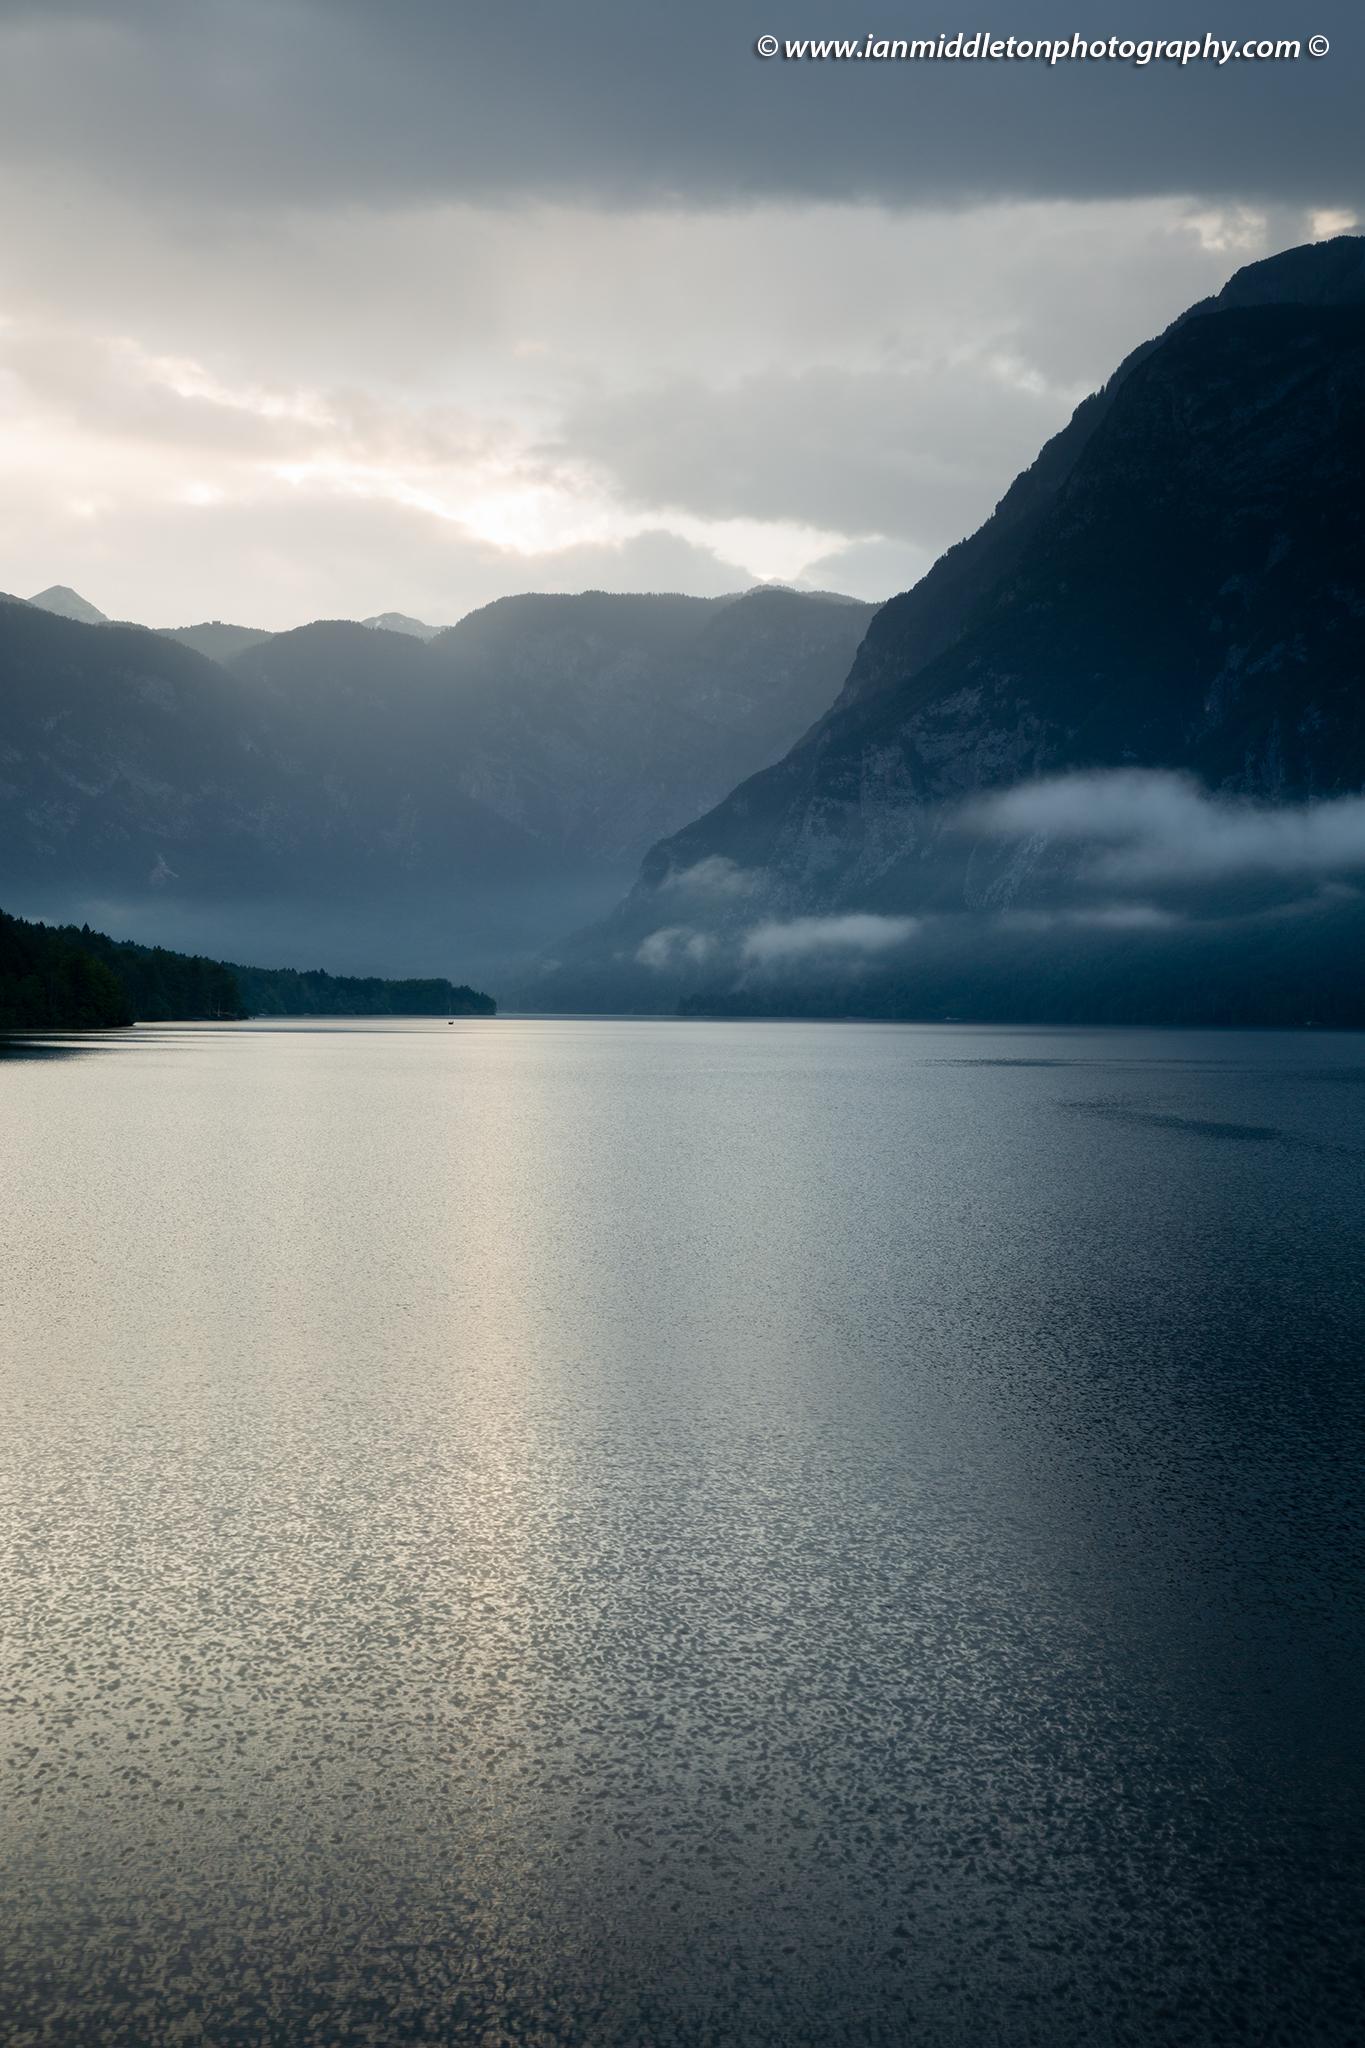 Rain over Lake Bohinj, Triglav National Park, Slovenia.